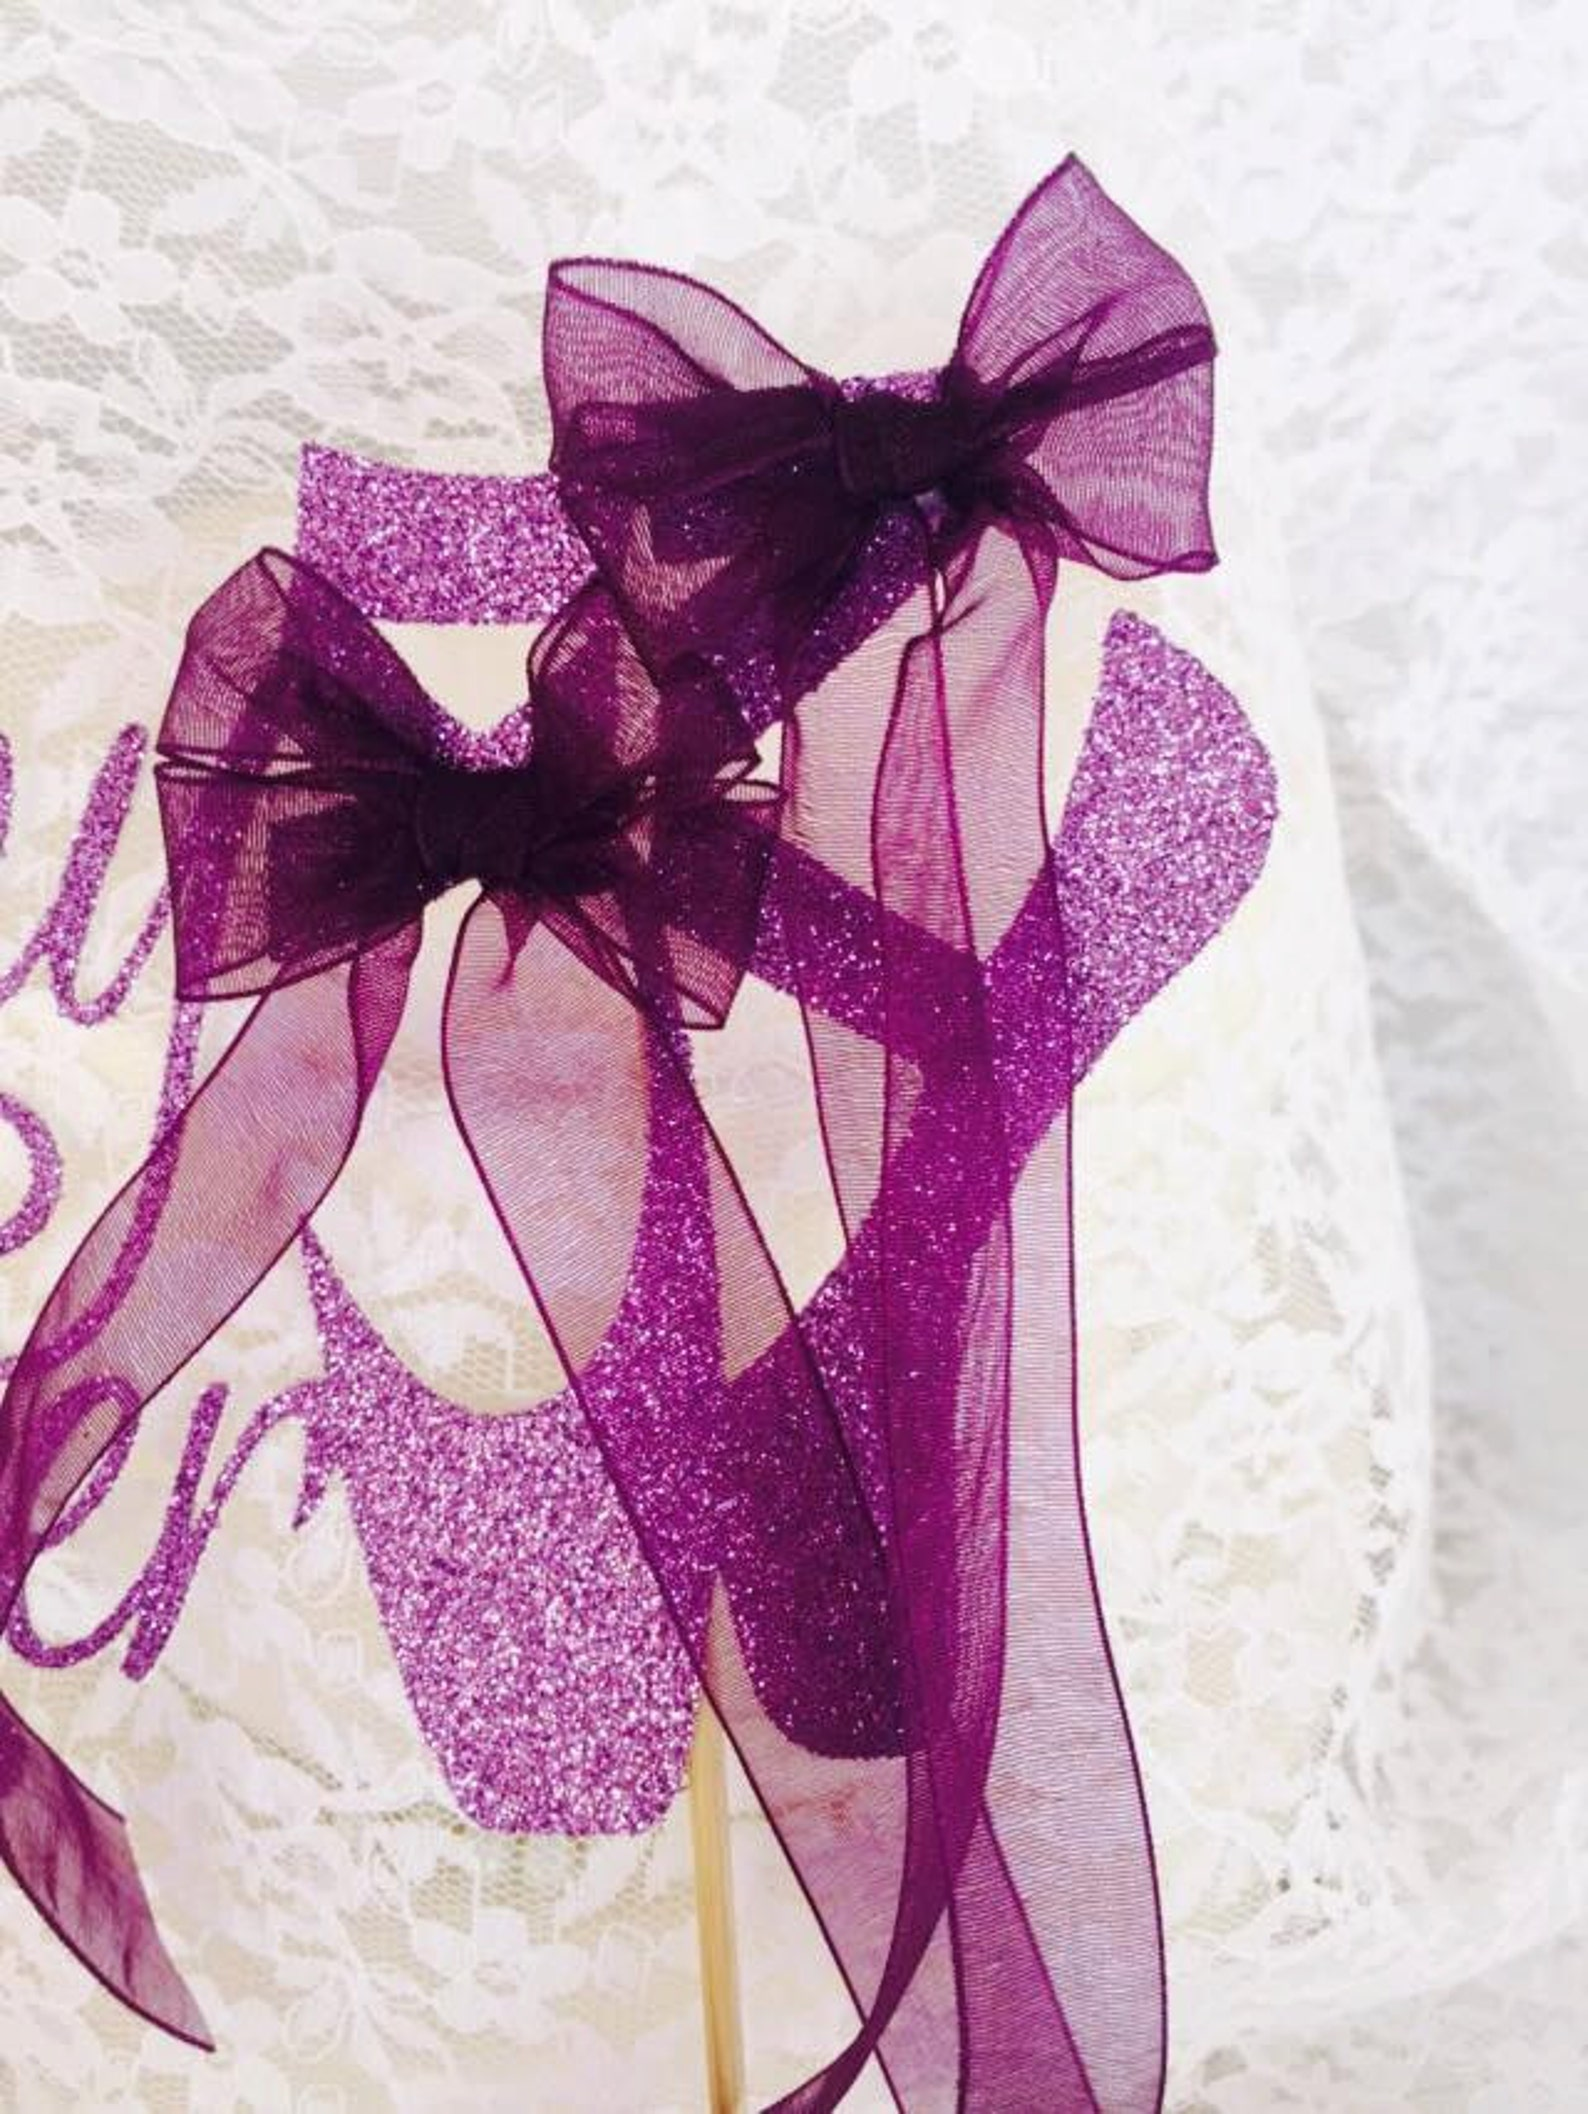 tiny dancer ballerina slippers cake topper - ballet event - custom colors - ballerina birthday party - ballerina decorations - b